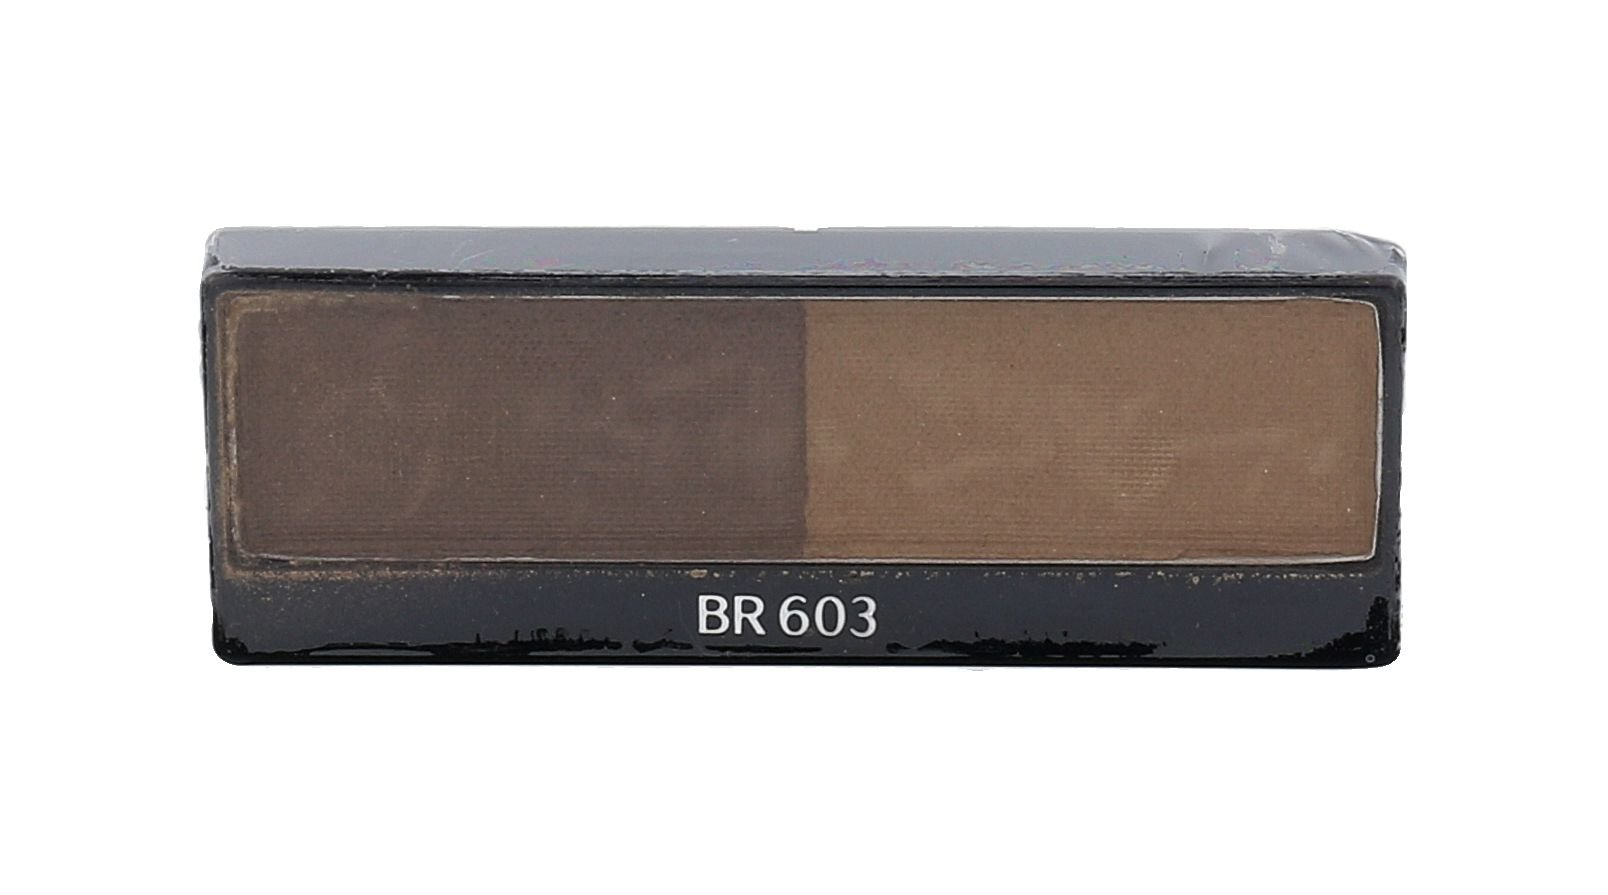 Shiseido Eyebrow Styling Compact Cosmetic 4ml BR603 Light Brown